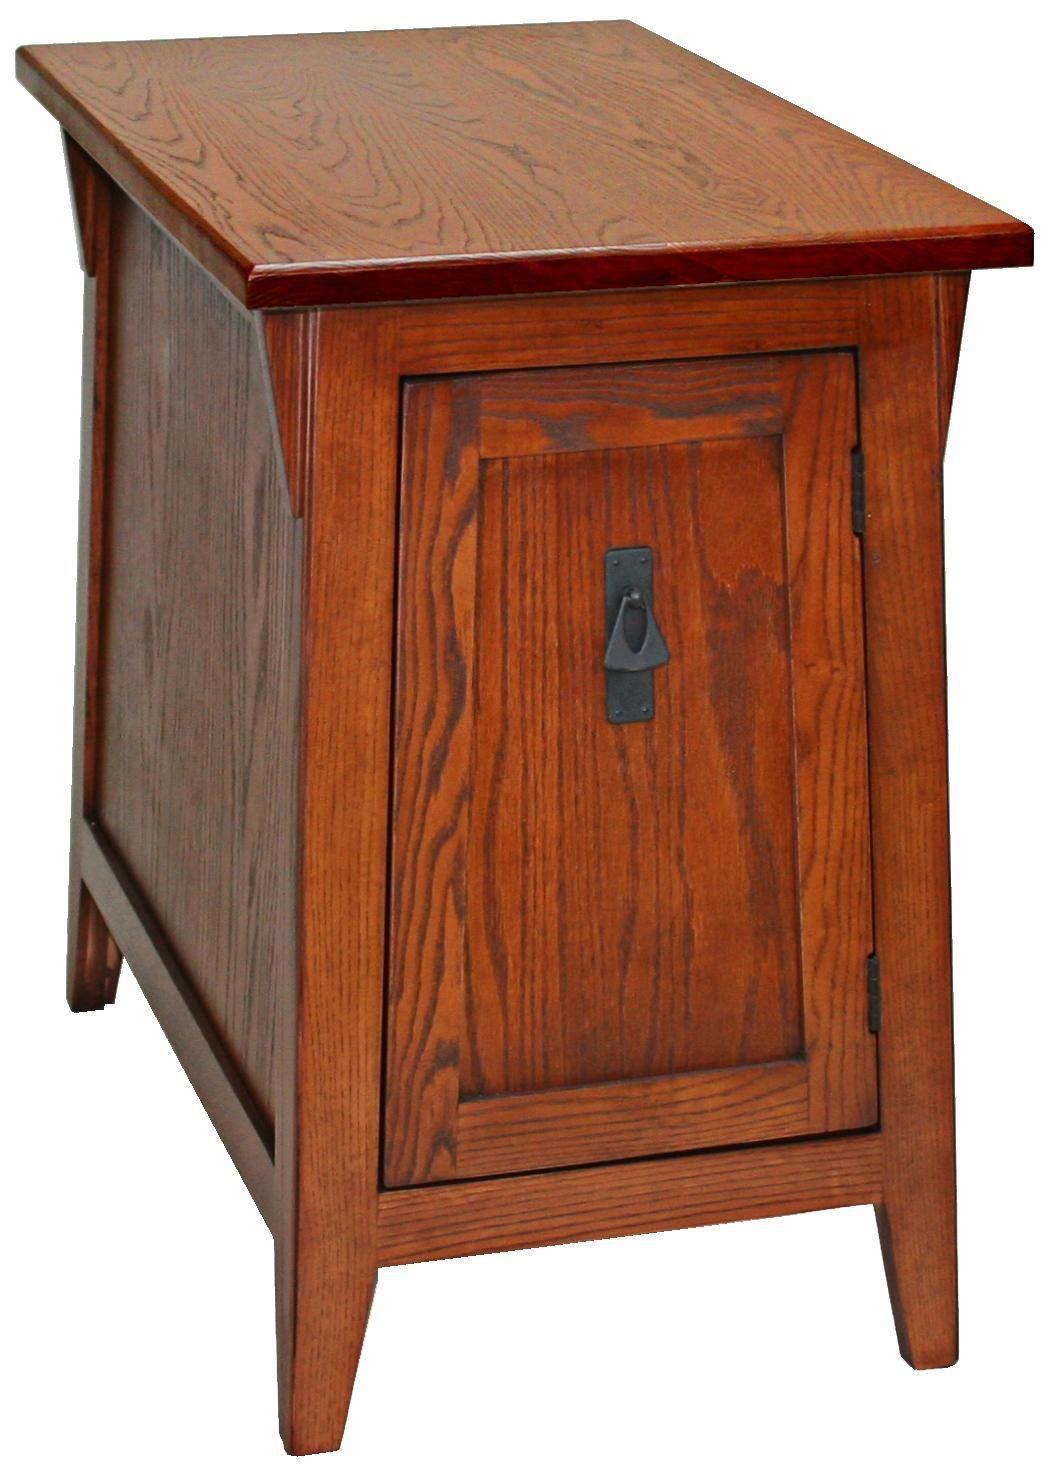 WoodworkingFurnitureVideos in 2020 Wood furniture diy